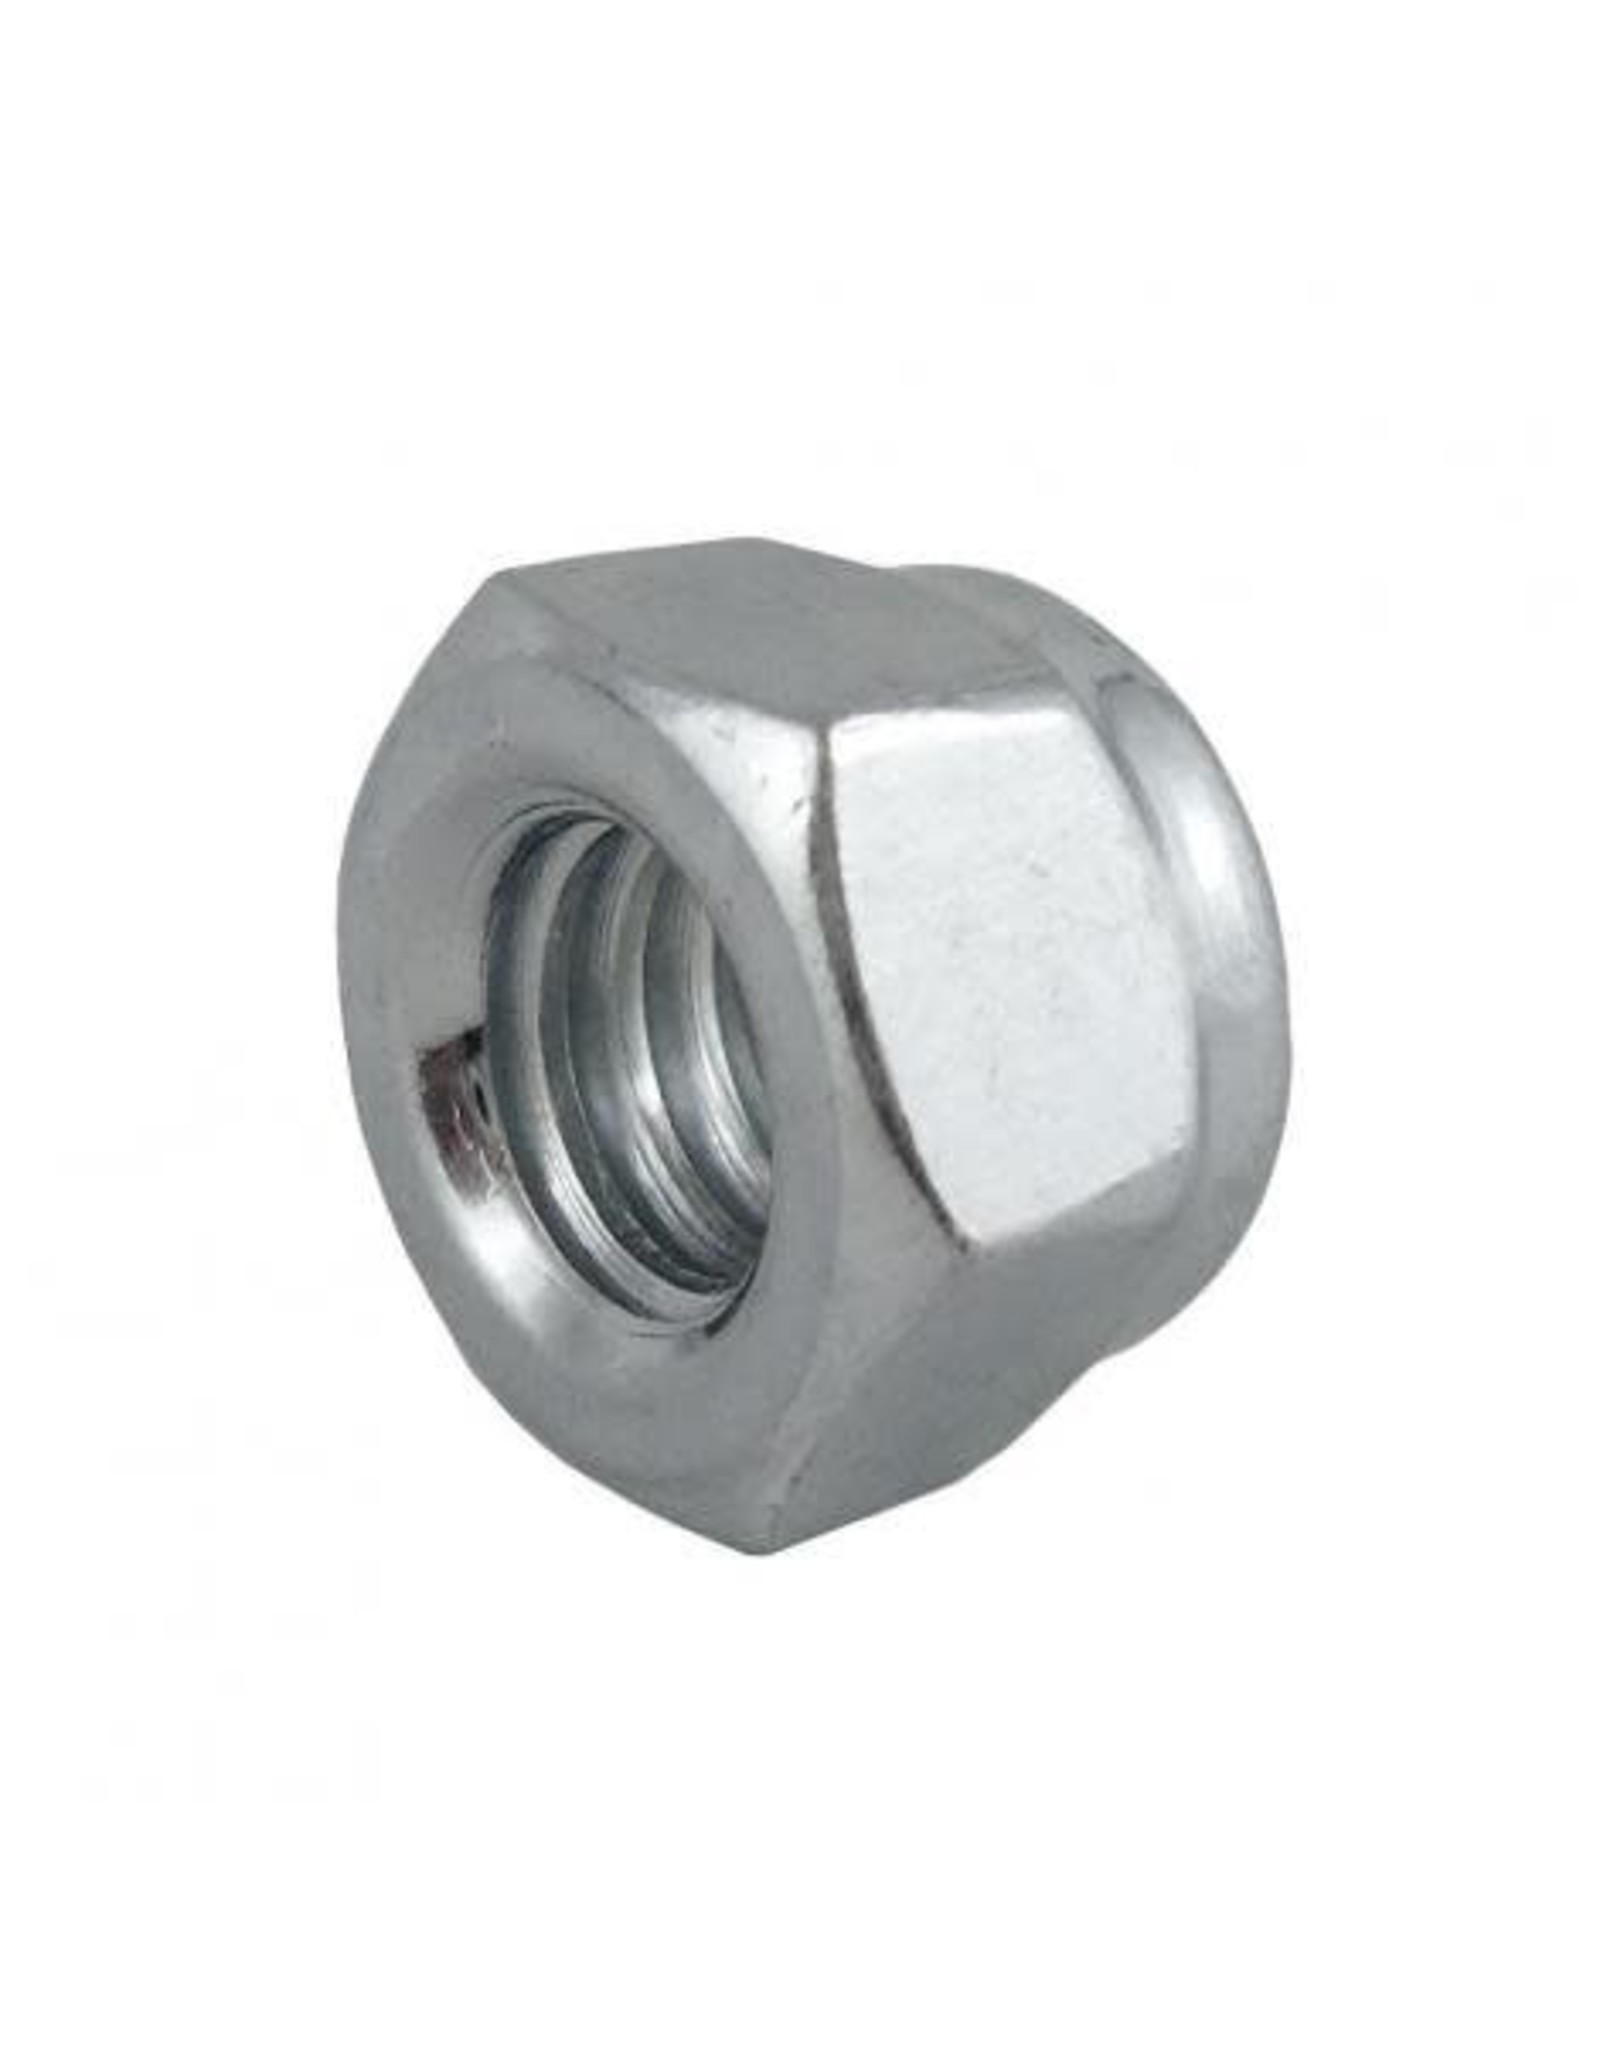 CO2 Tank Handwheel Nut